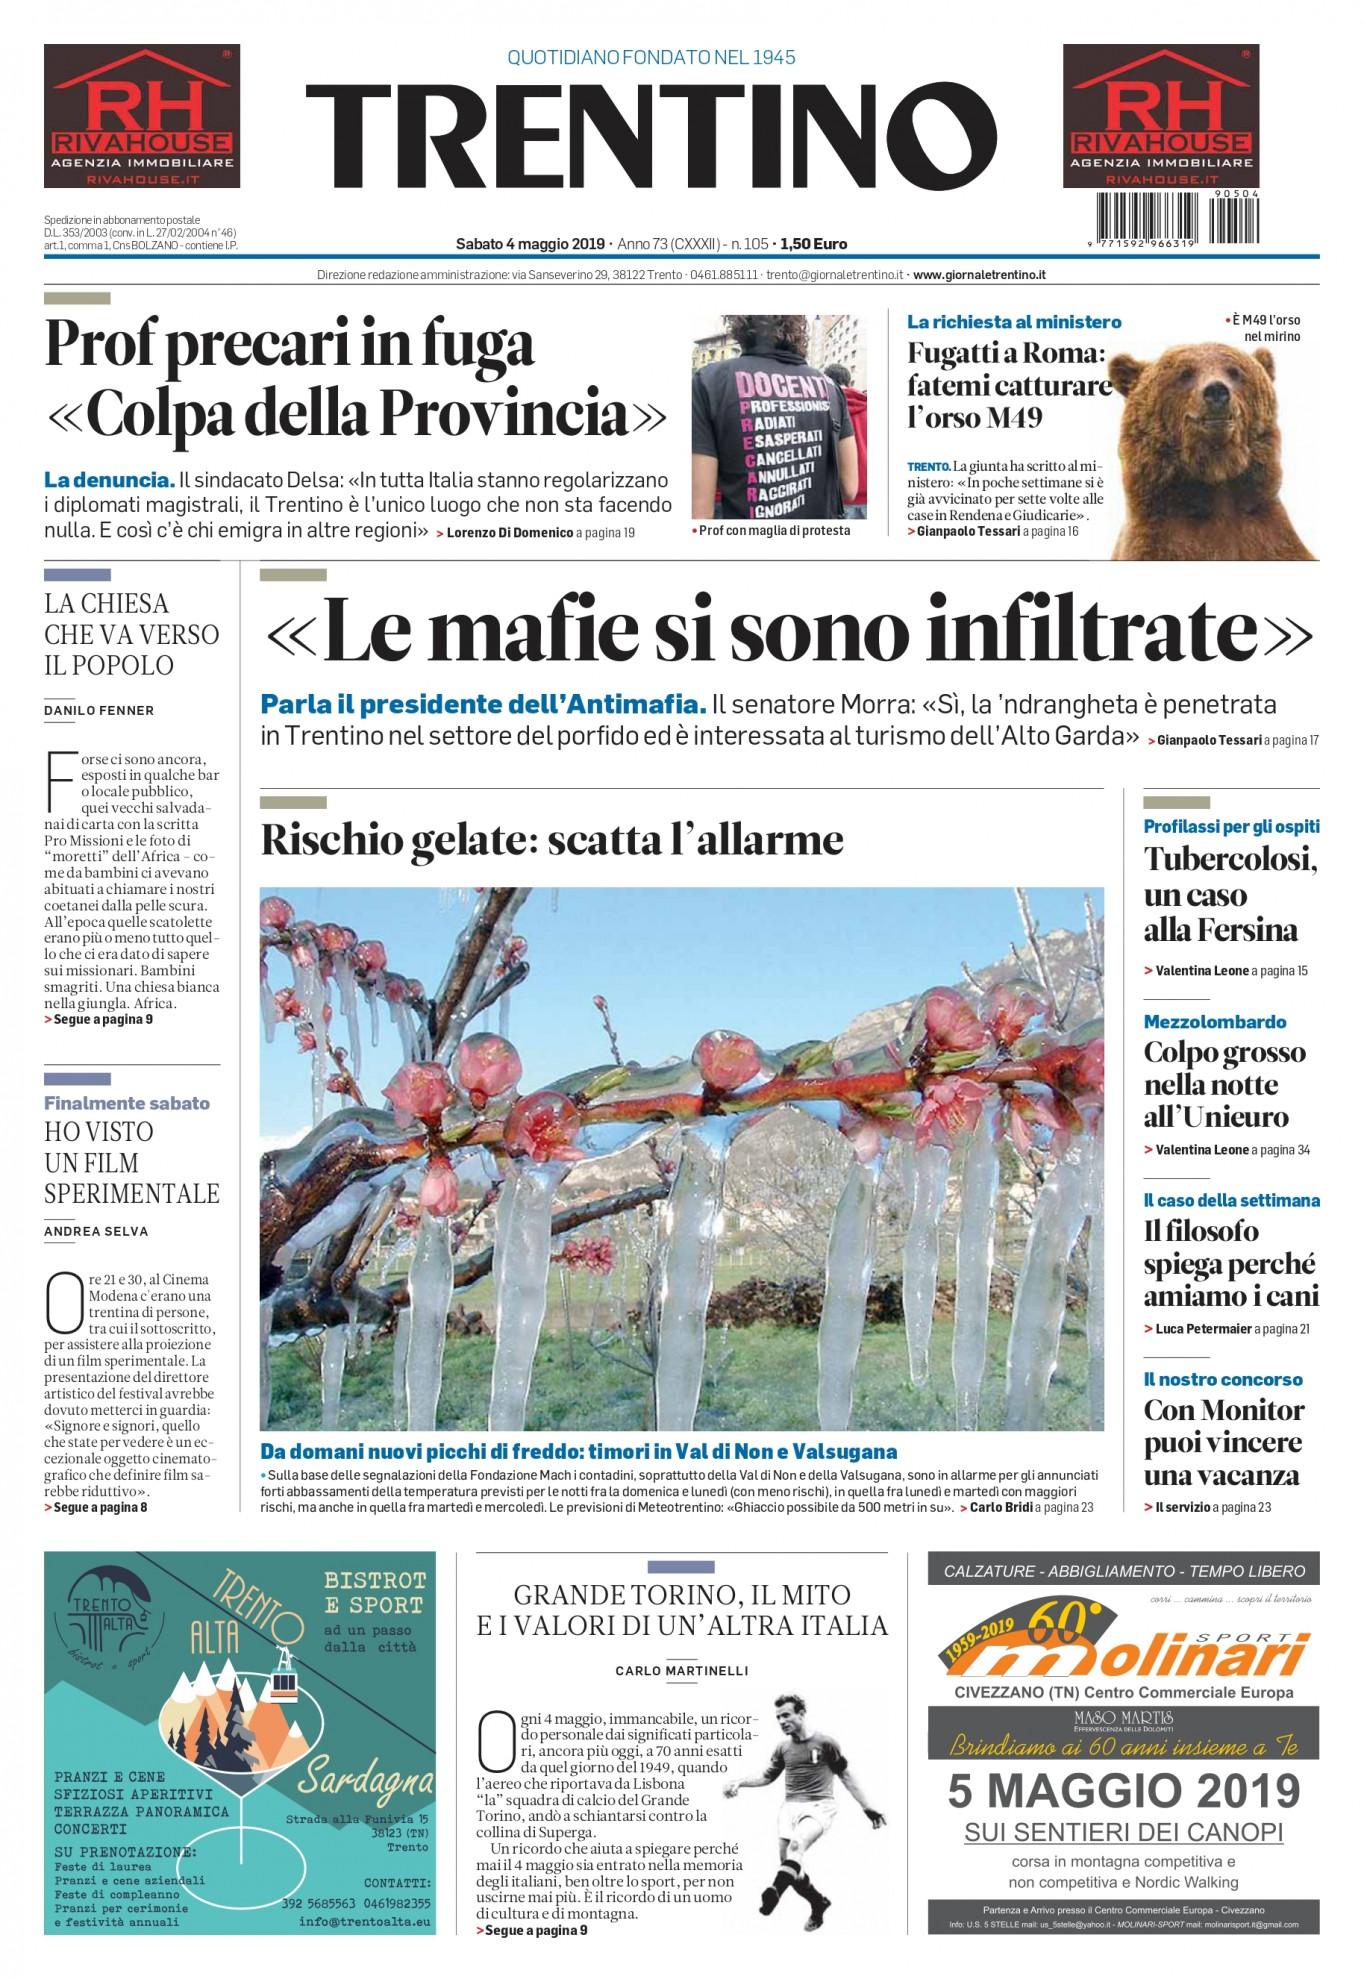 Trentino-04.05.2019-01_page-0001